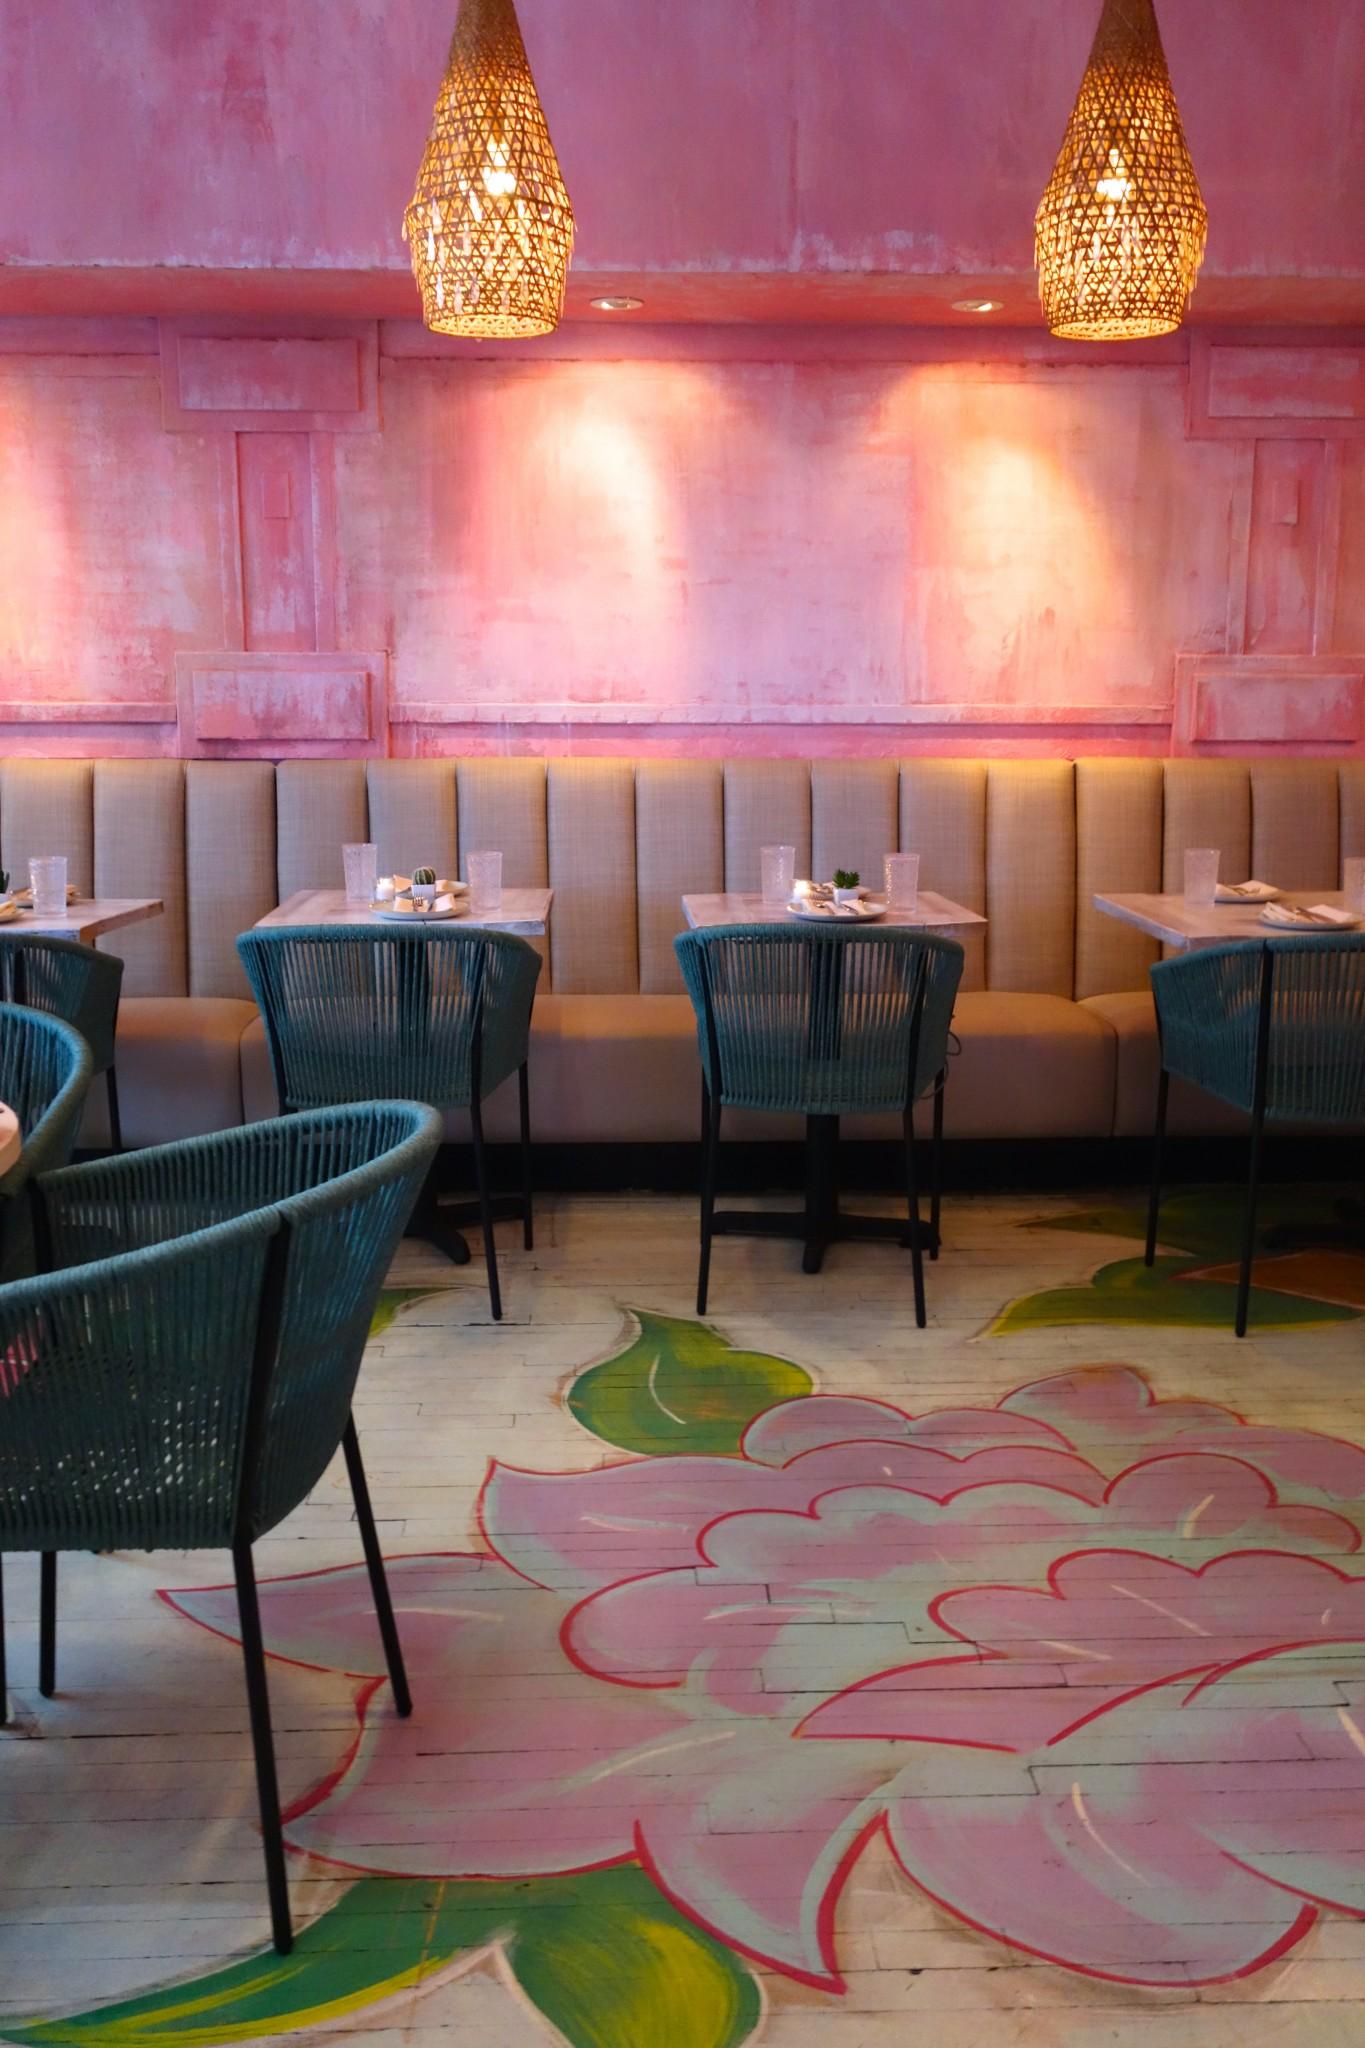 instagrammable restaurants in boston, the-alyst.com